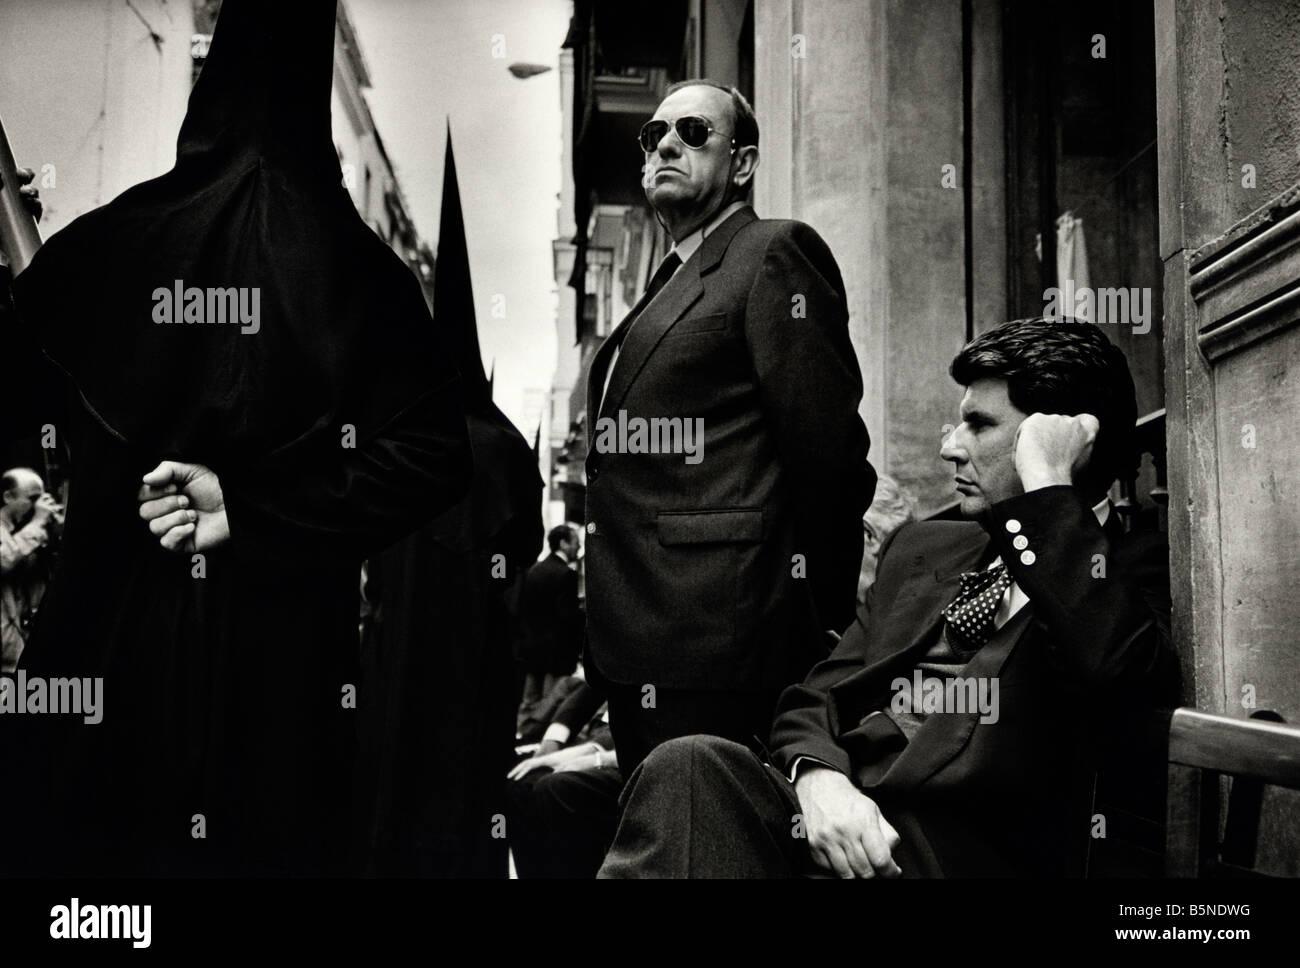 Members of the Brotherhood pass men on street during Semana Santa processions. Seville, Spain. - Stock Image